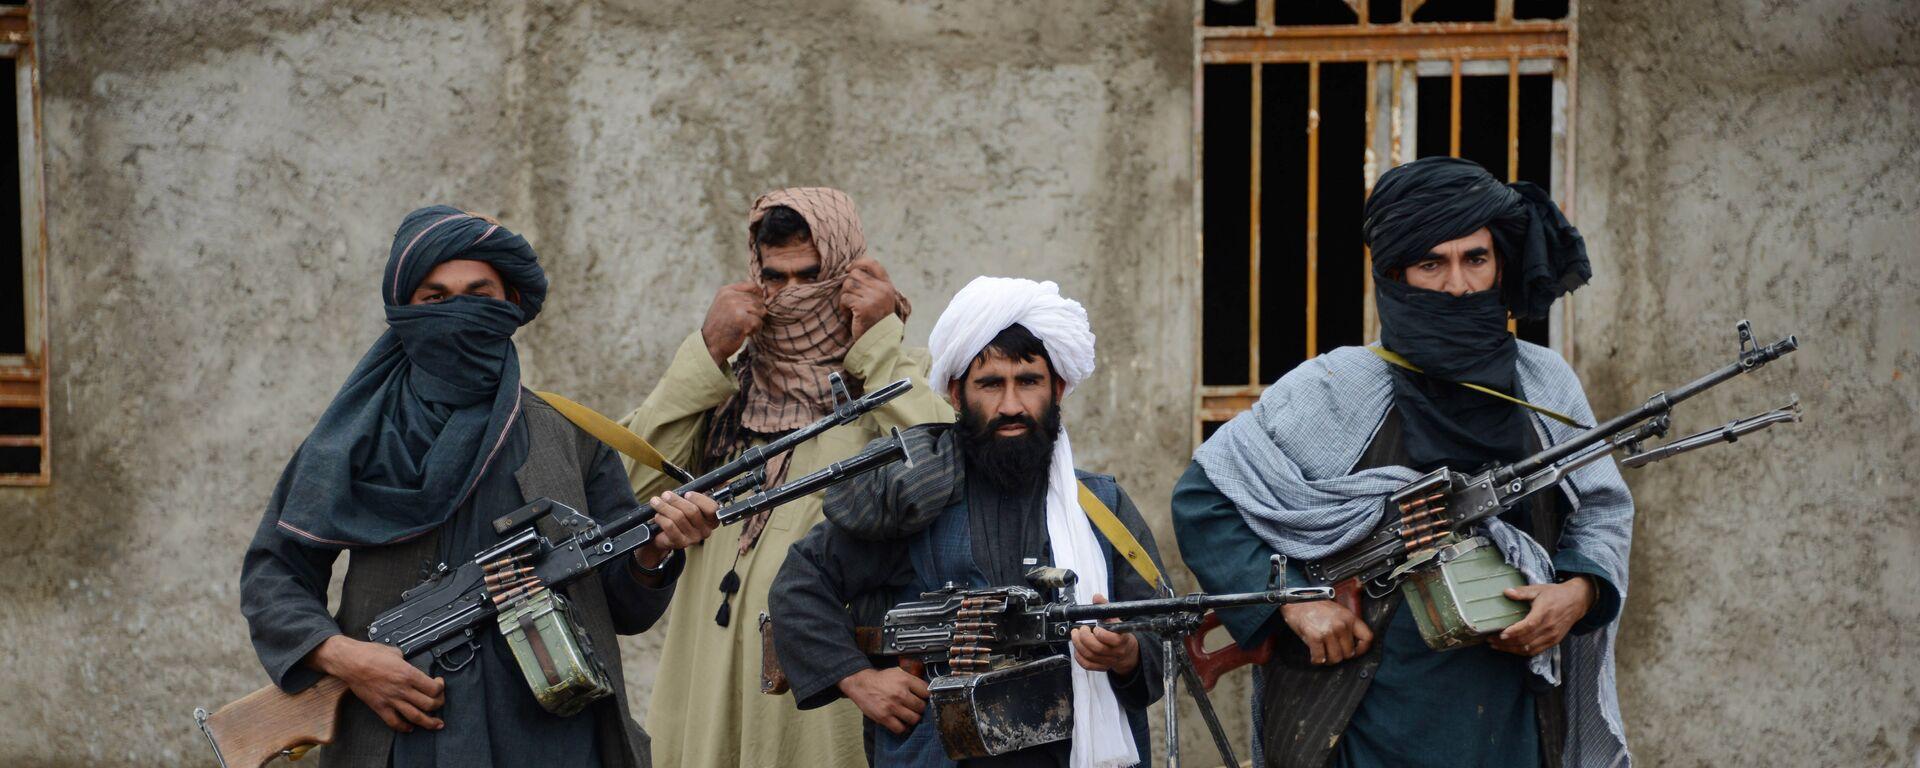 Talibanes afganos - Sputnik Mundo, 1920, 30.06.2021